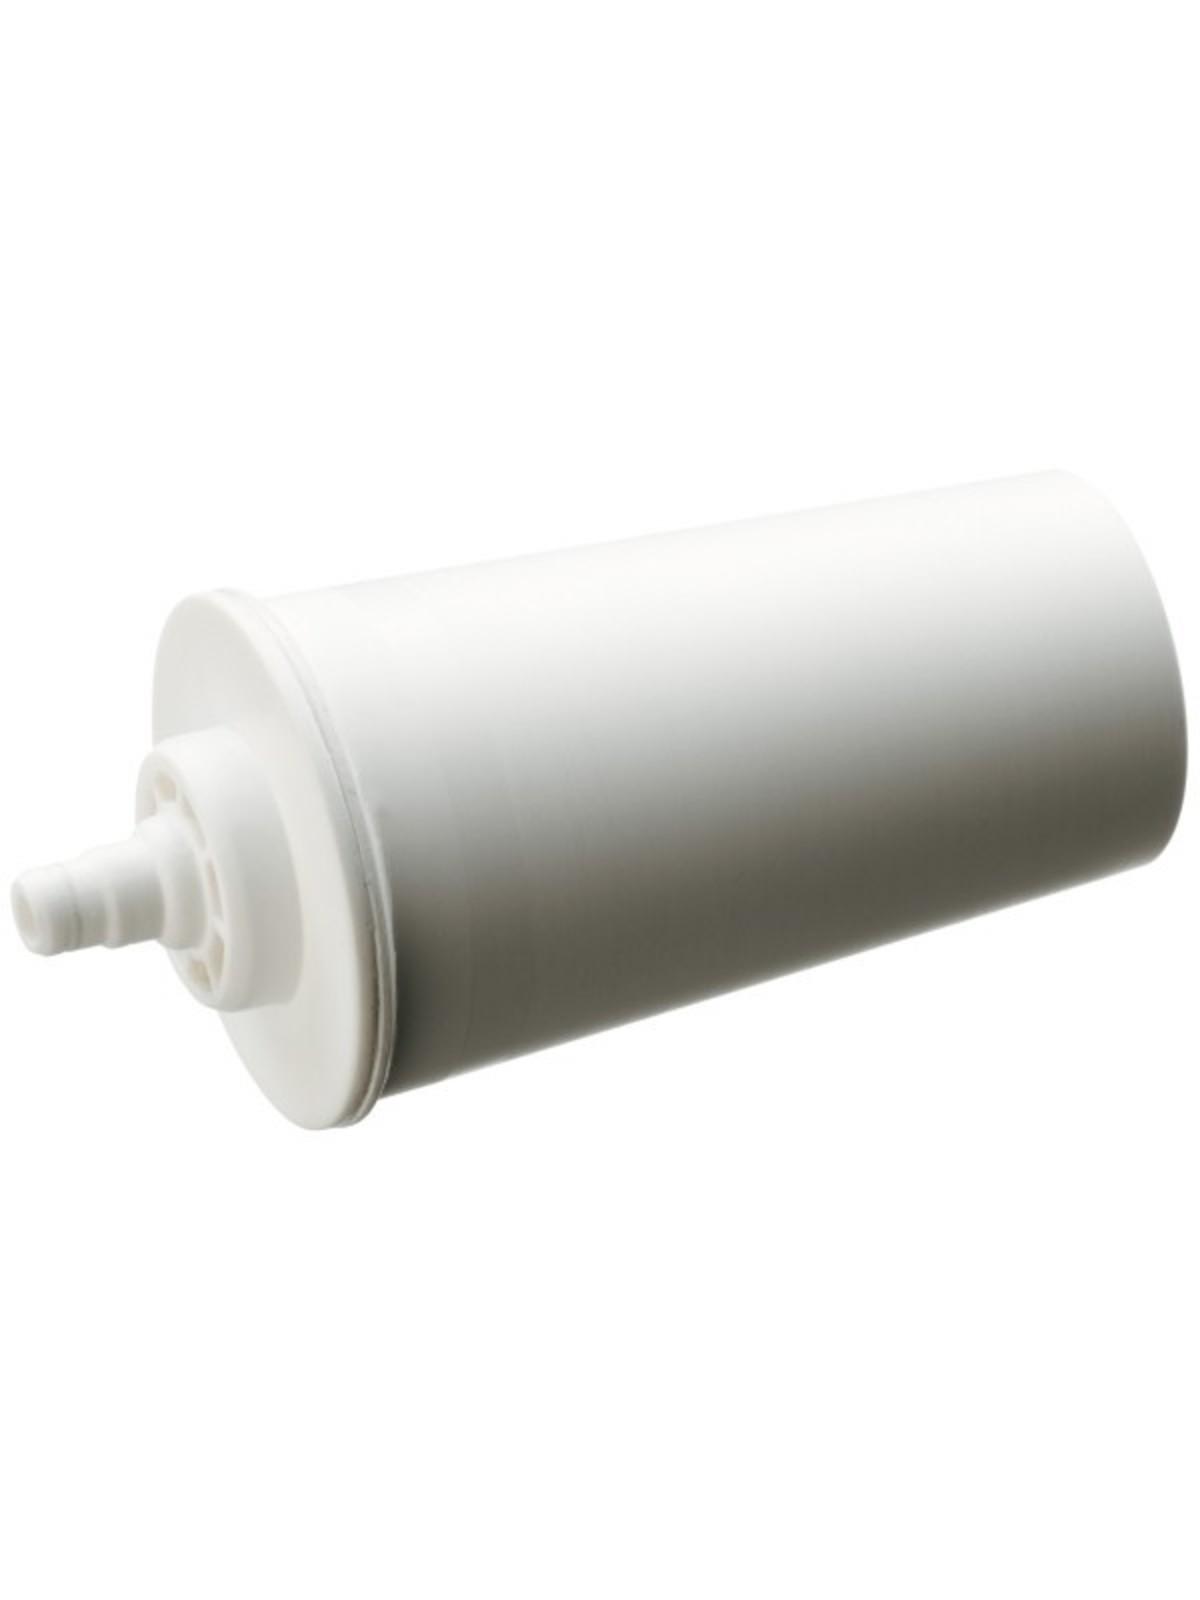 WMF Waterfilter